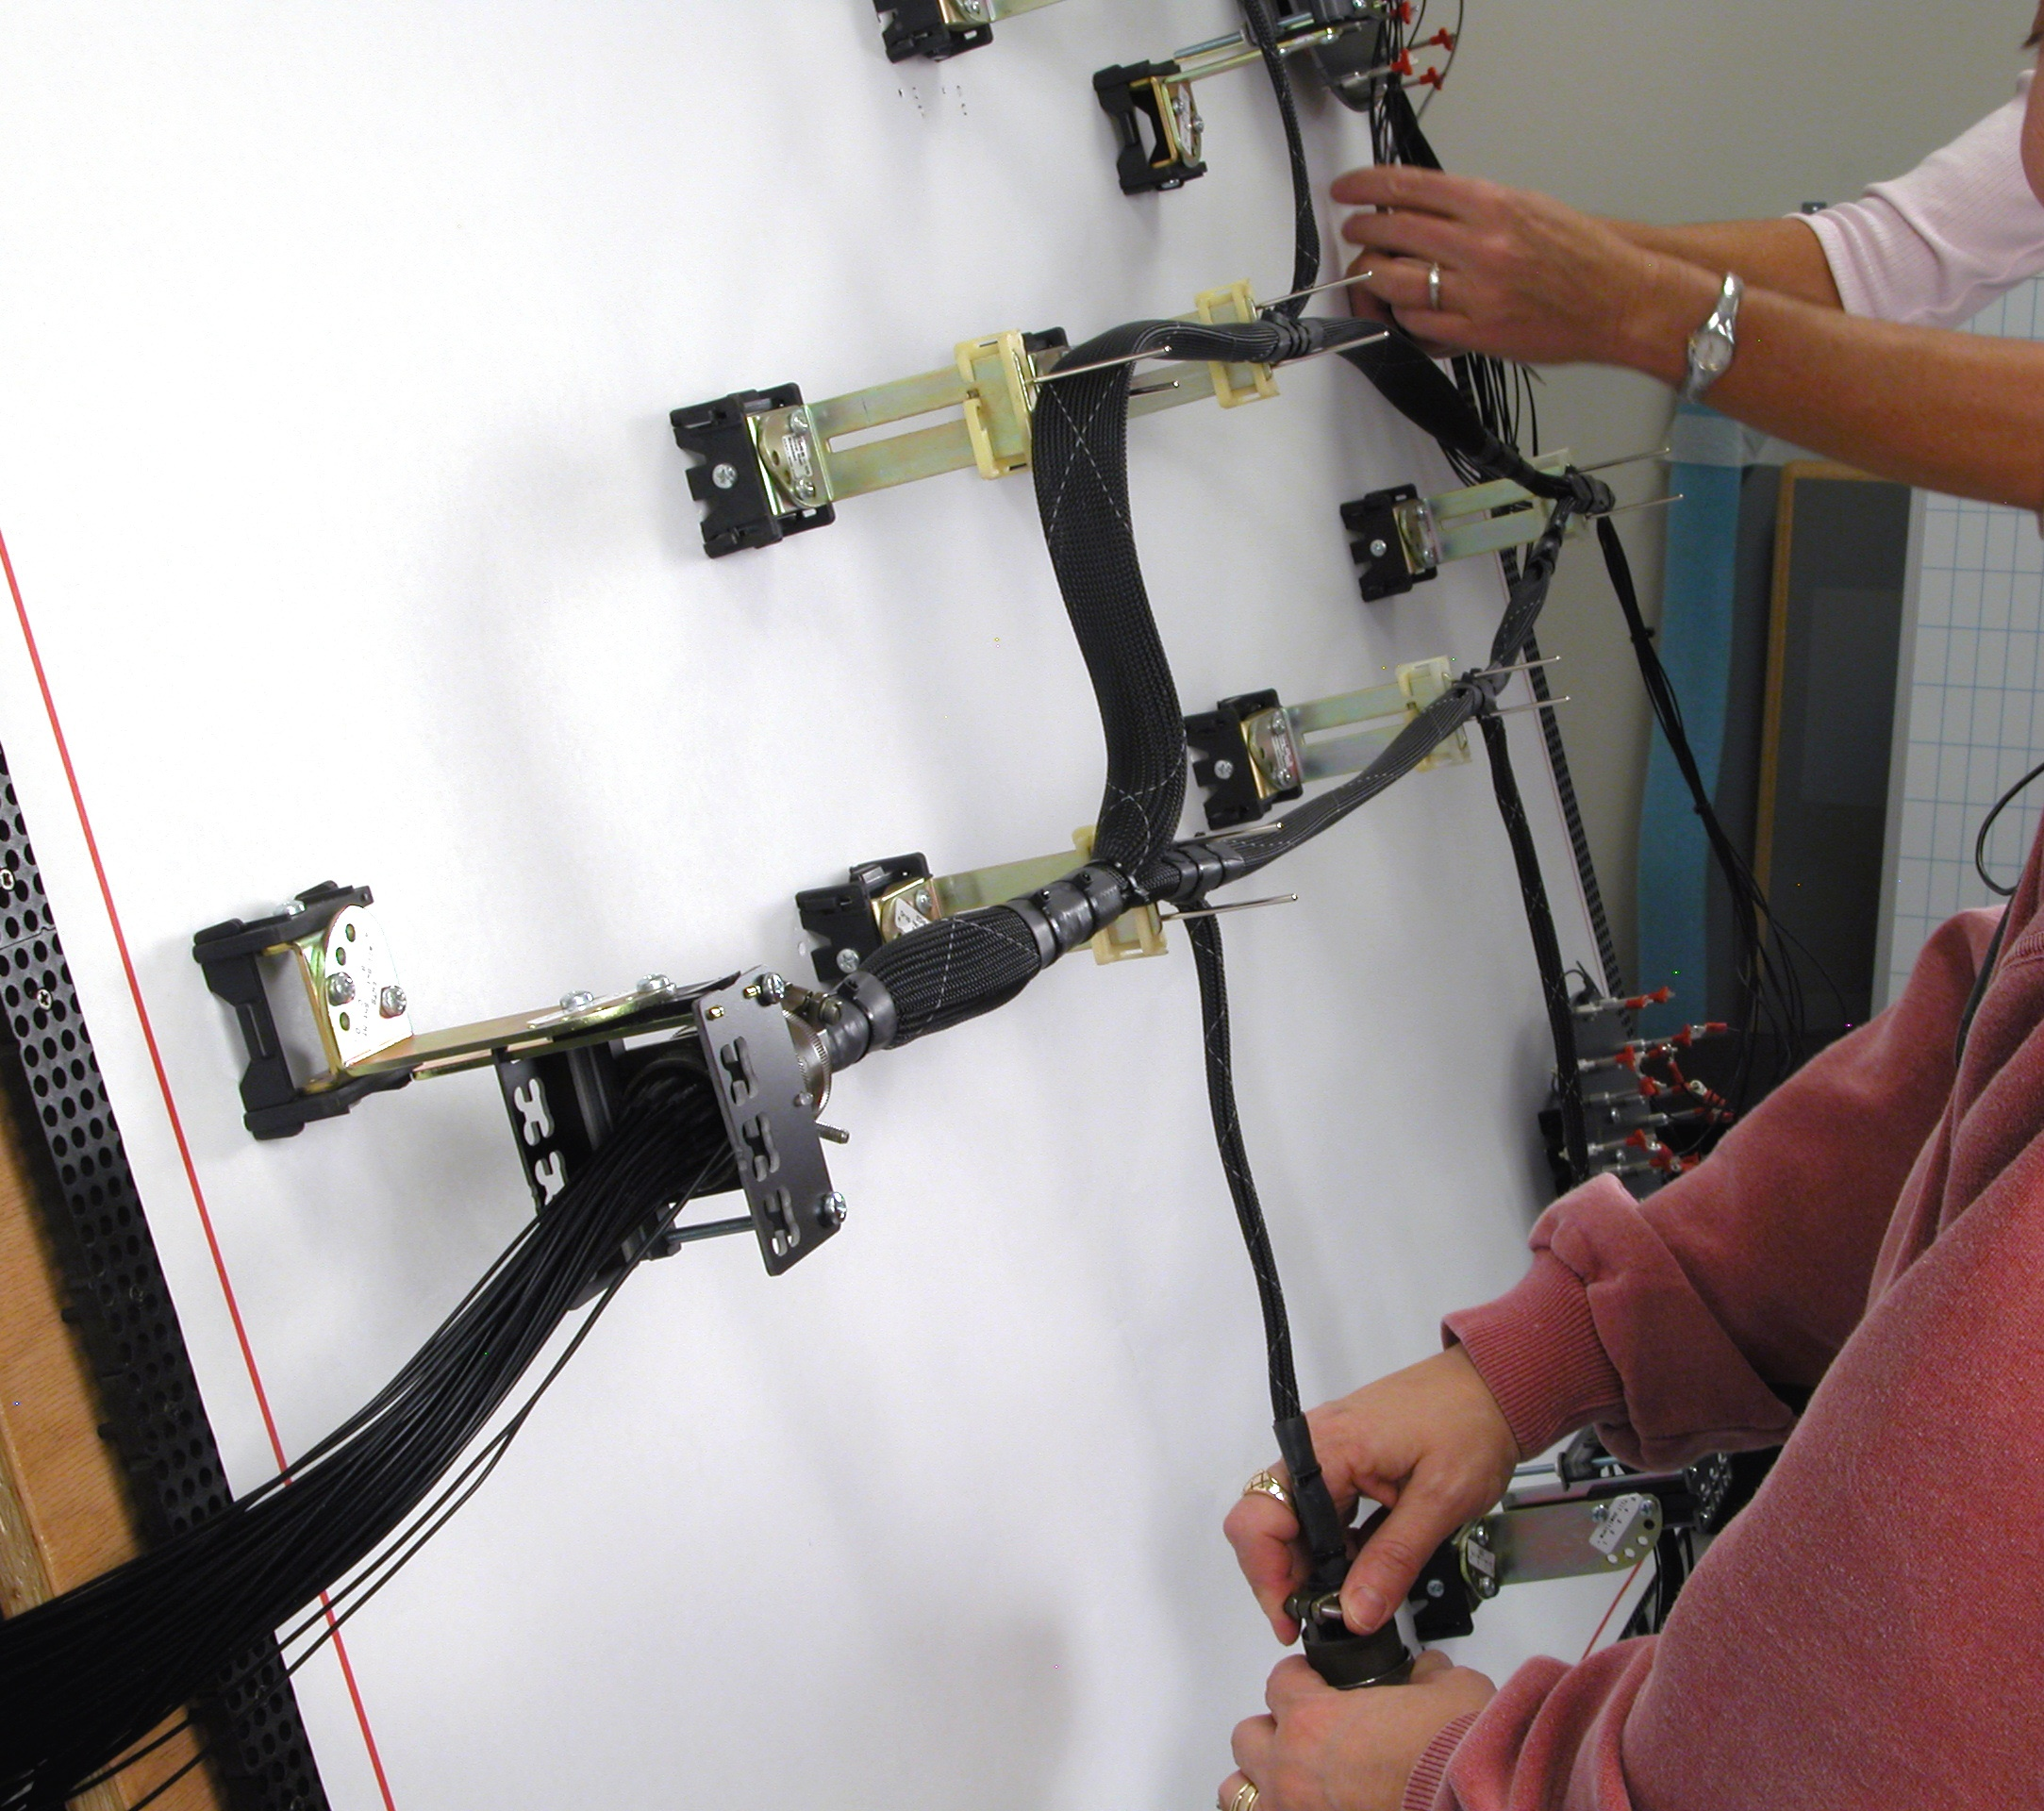 car wiring harness board wiring diagram progresif rh 19 vcew sandvik sps de Colored Wire Loom Aircraft Wiring Loom Board